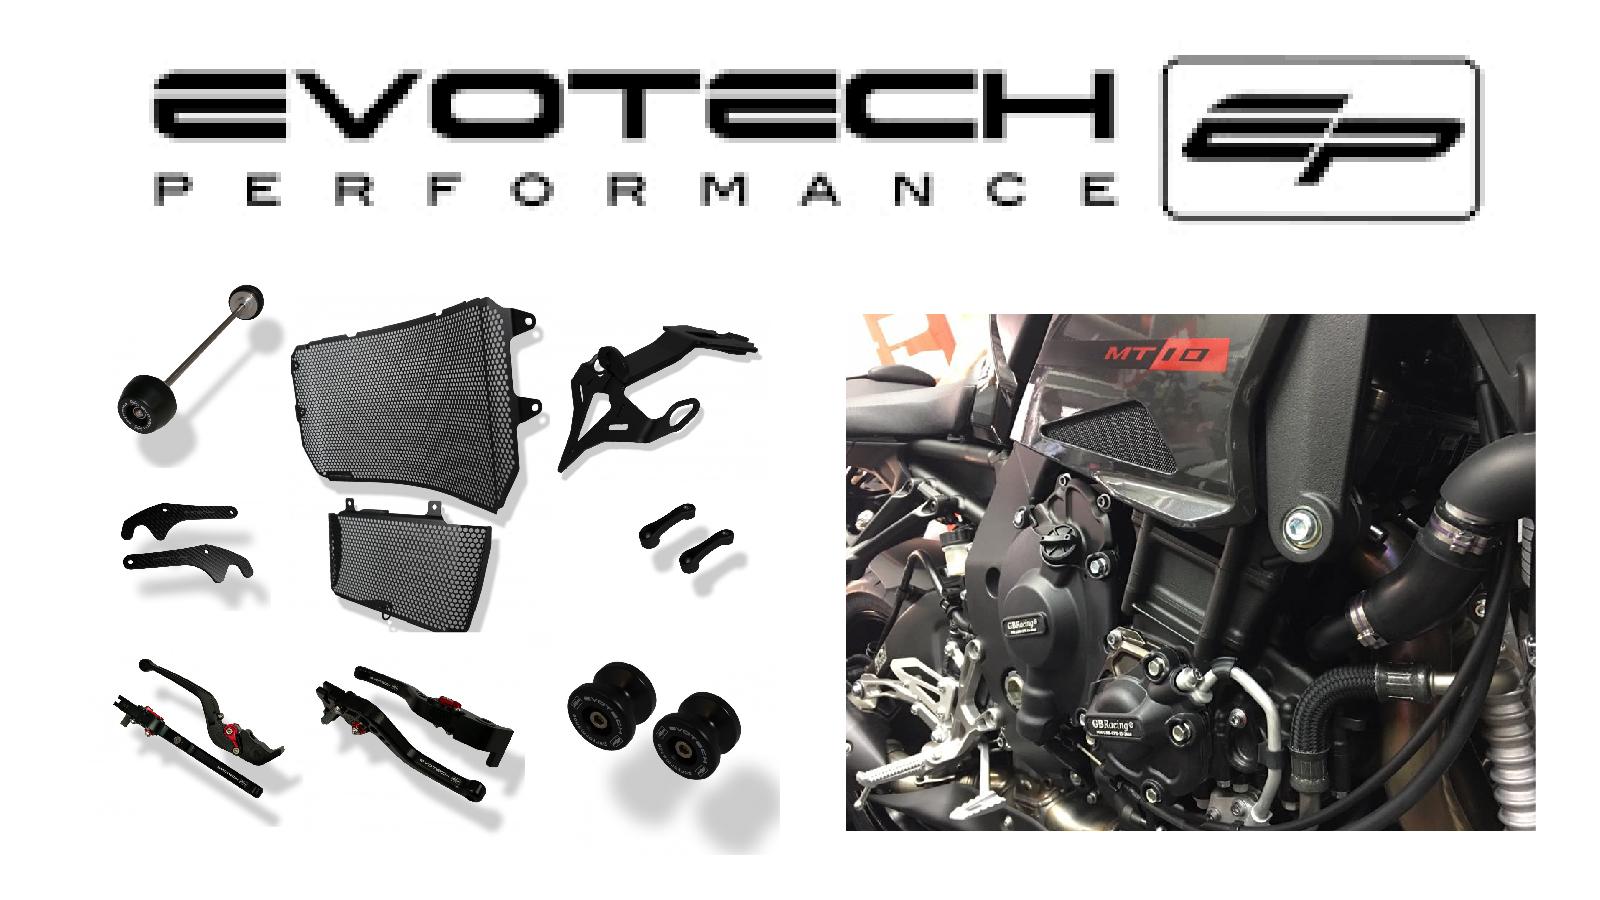 evotech-banner-01